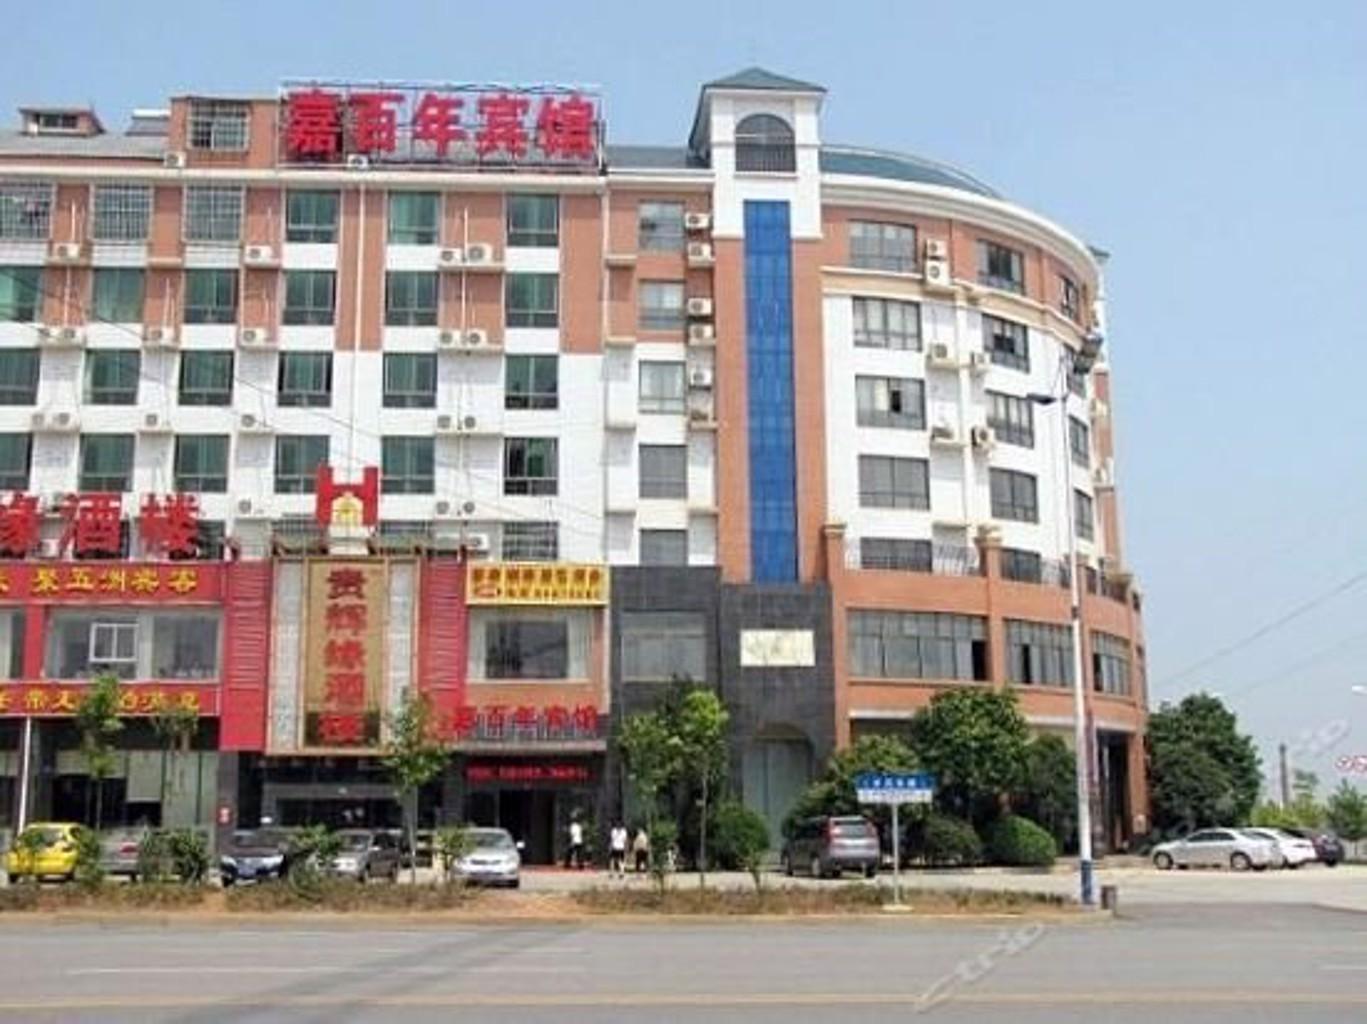 Gallery image of Jiabainian Business Motel